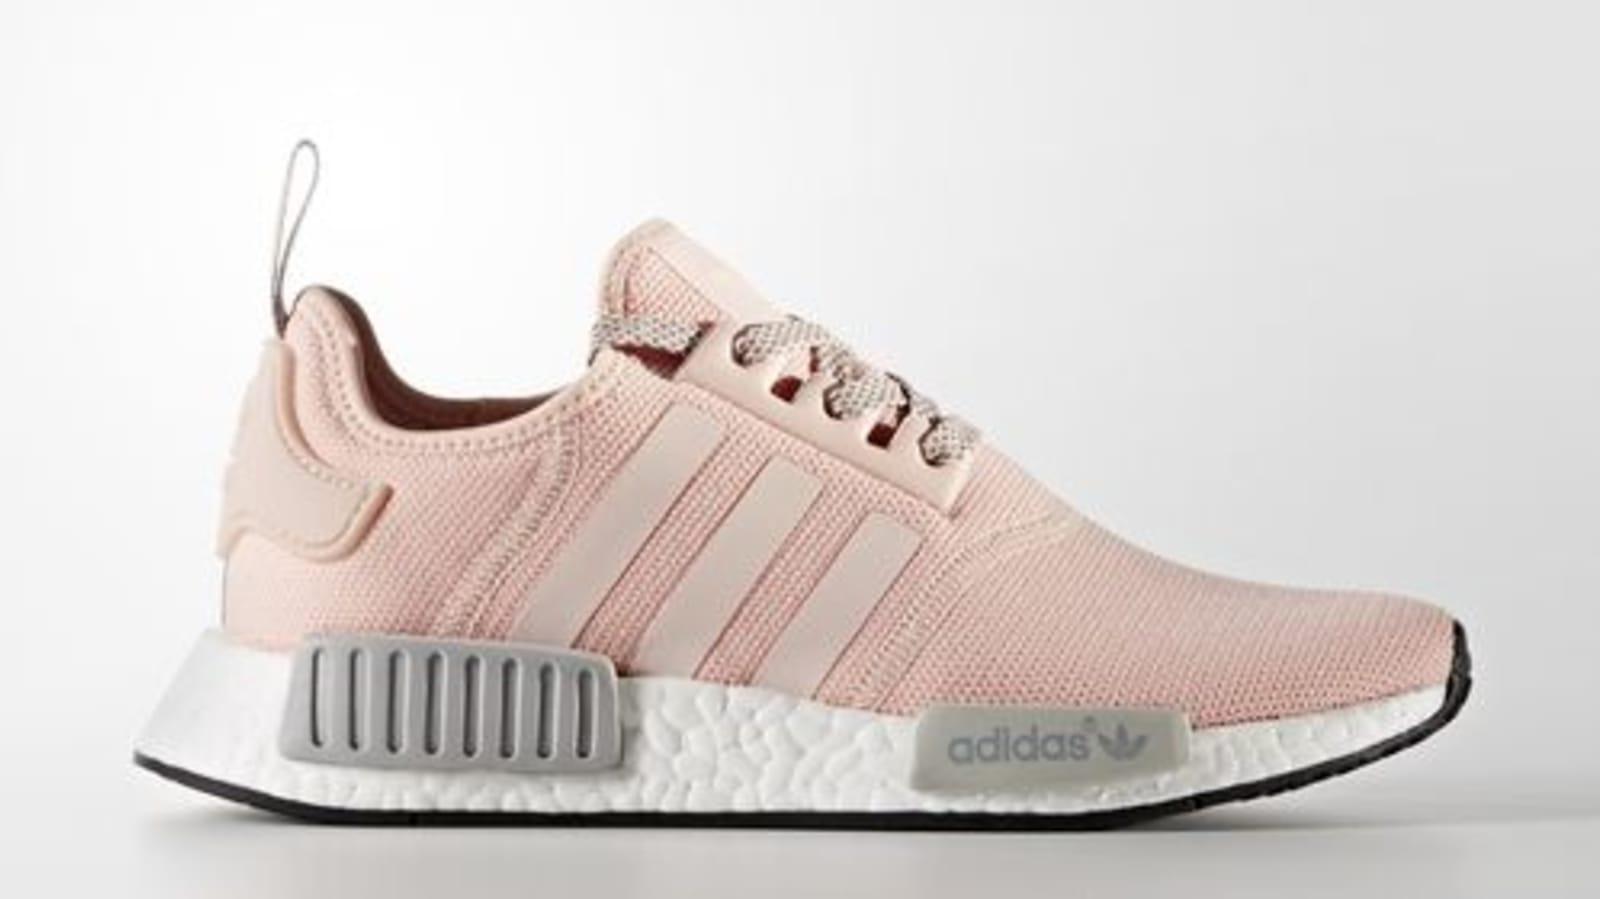 Adidas NMD_CS2 Ronin Release Date BA7189 Release Date